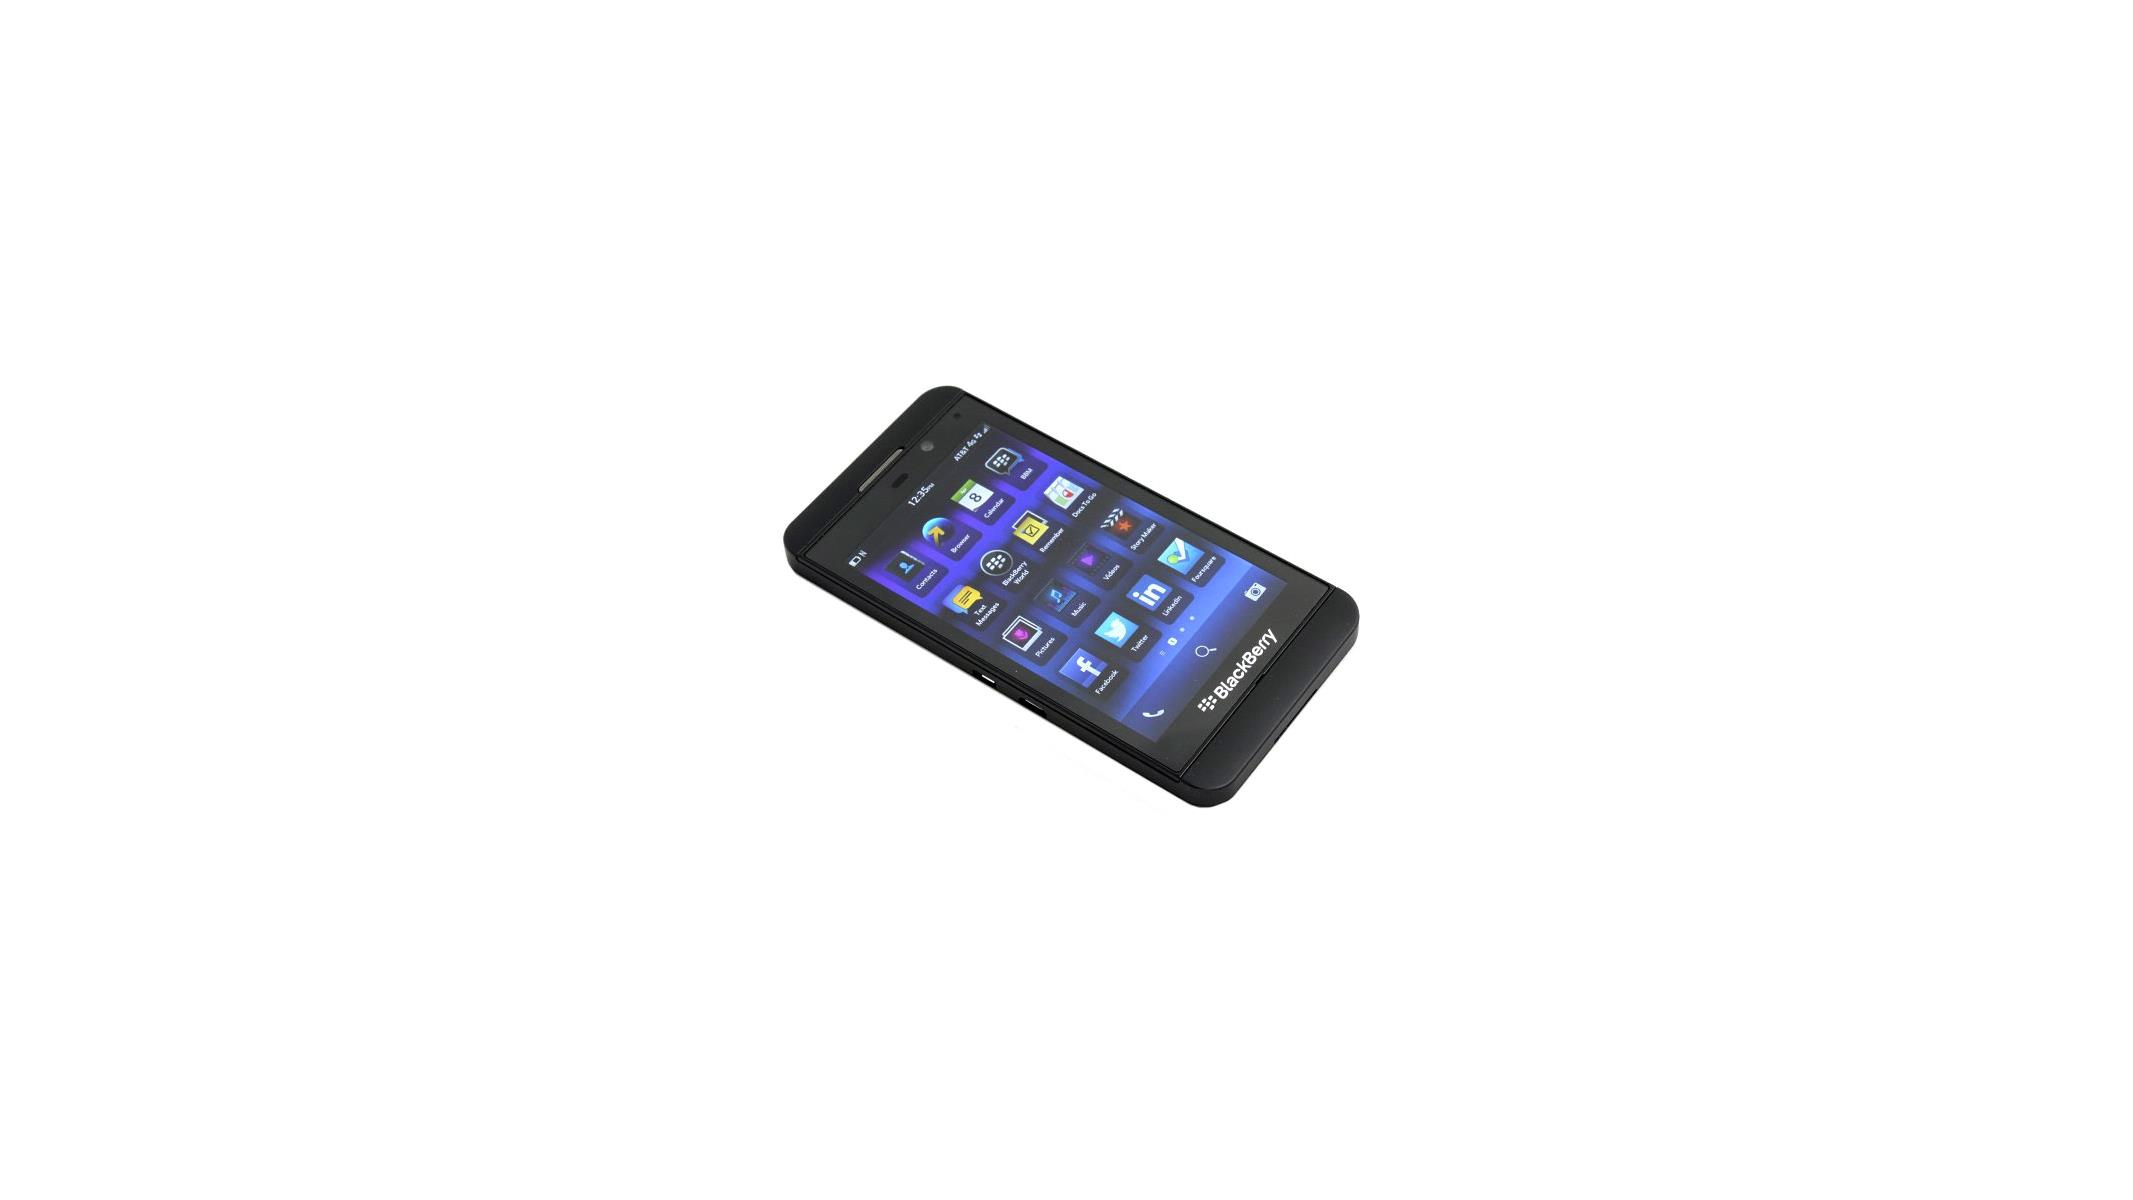 Reinventing BlackBerry: BlackBerry Z10 Review | HotHardware